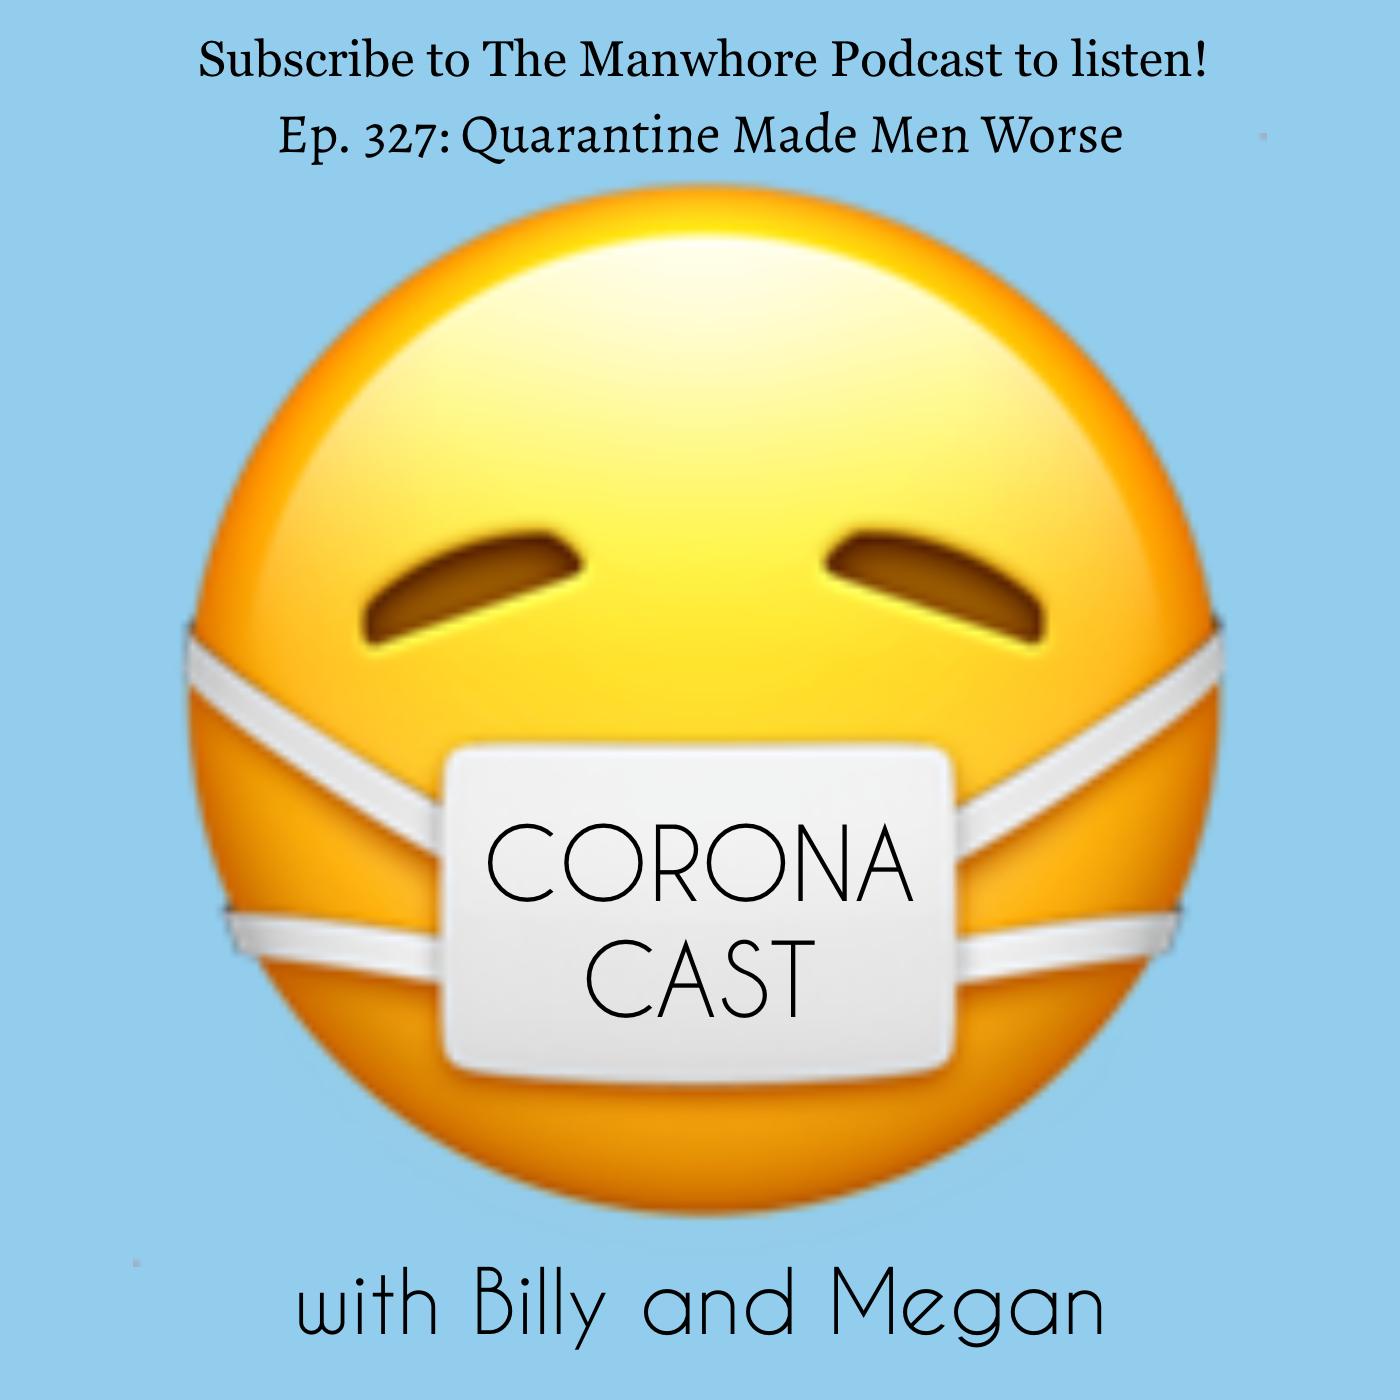 The Manwhore Podcast: A Sex-Positive Quest - Ep. 327: Corona Cast Part 9 - Quarantine Made Men Worse